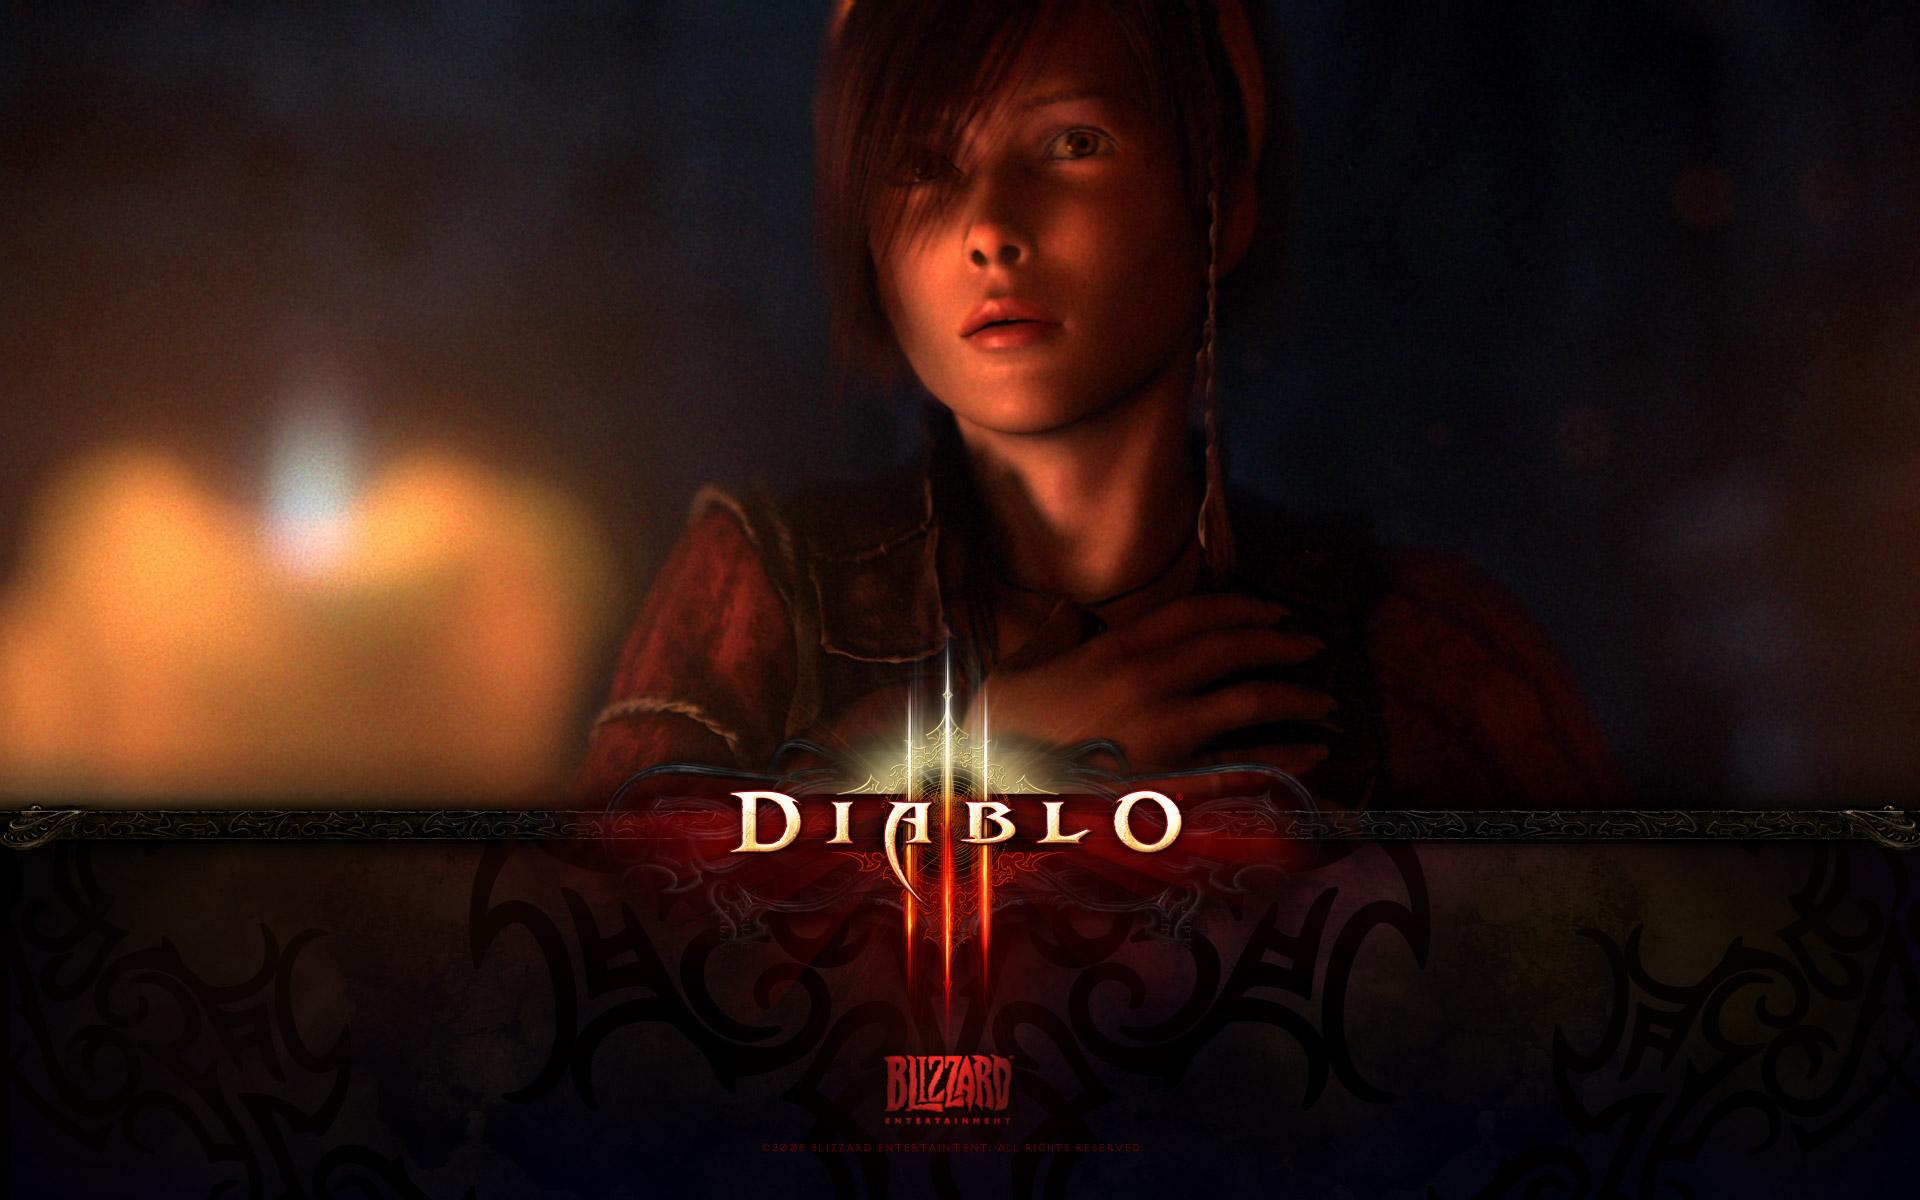 Diablo 3 wallpaper 18